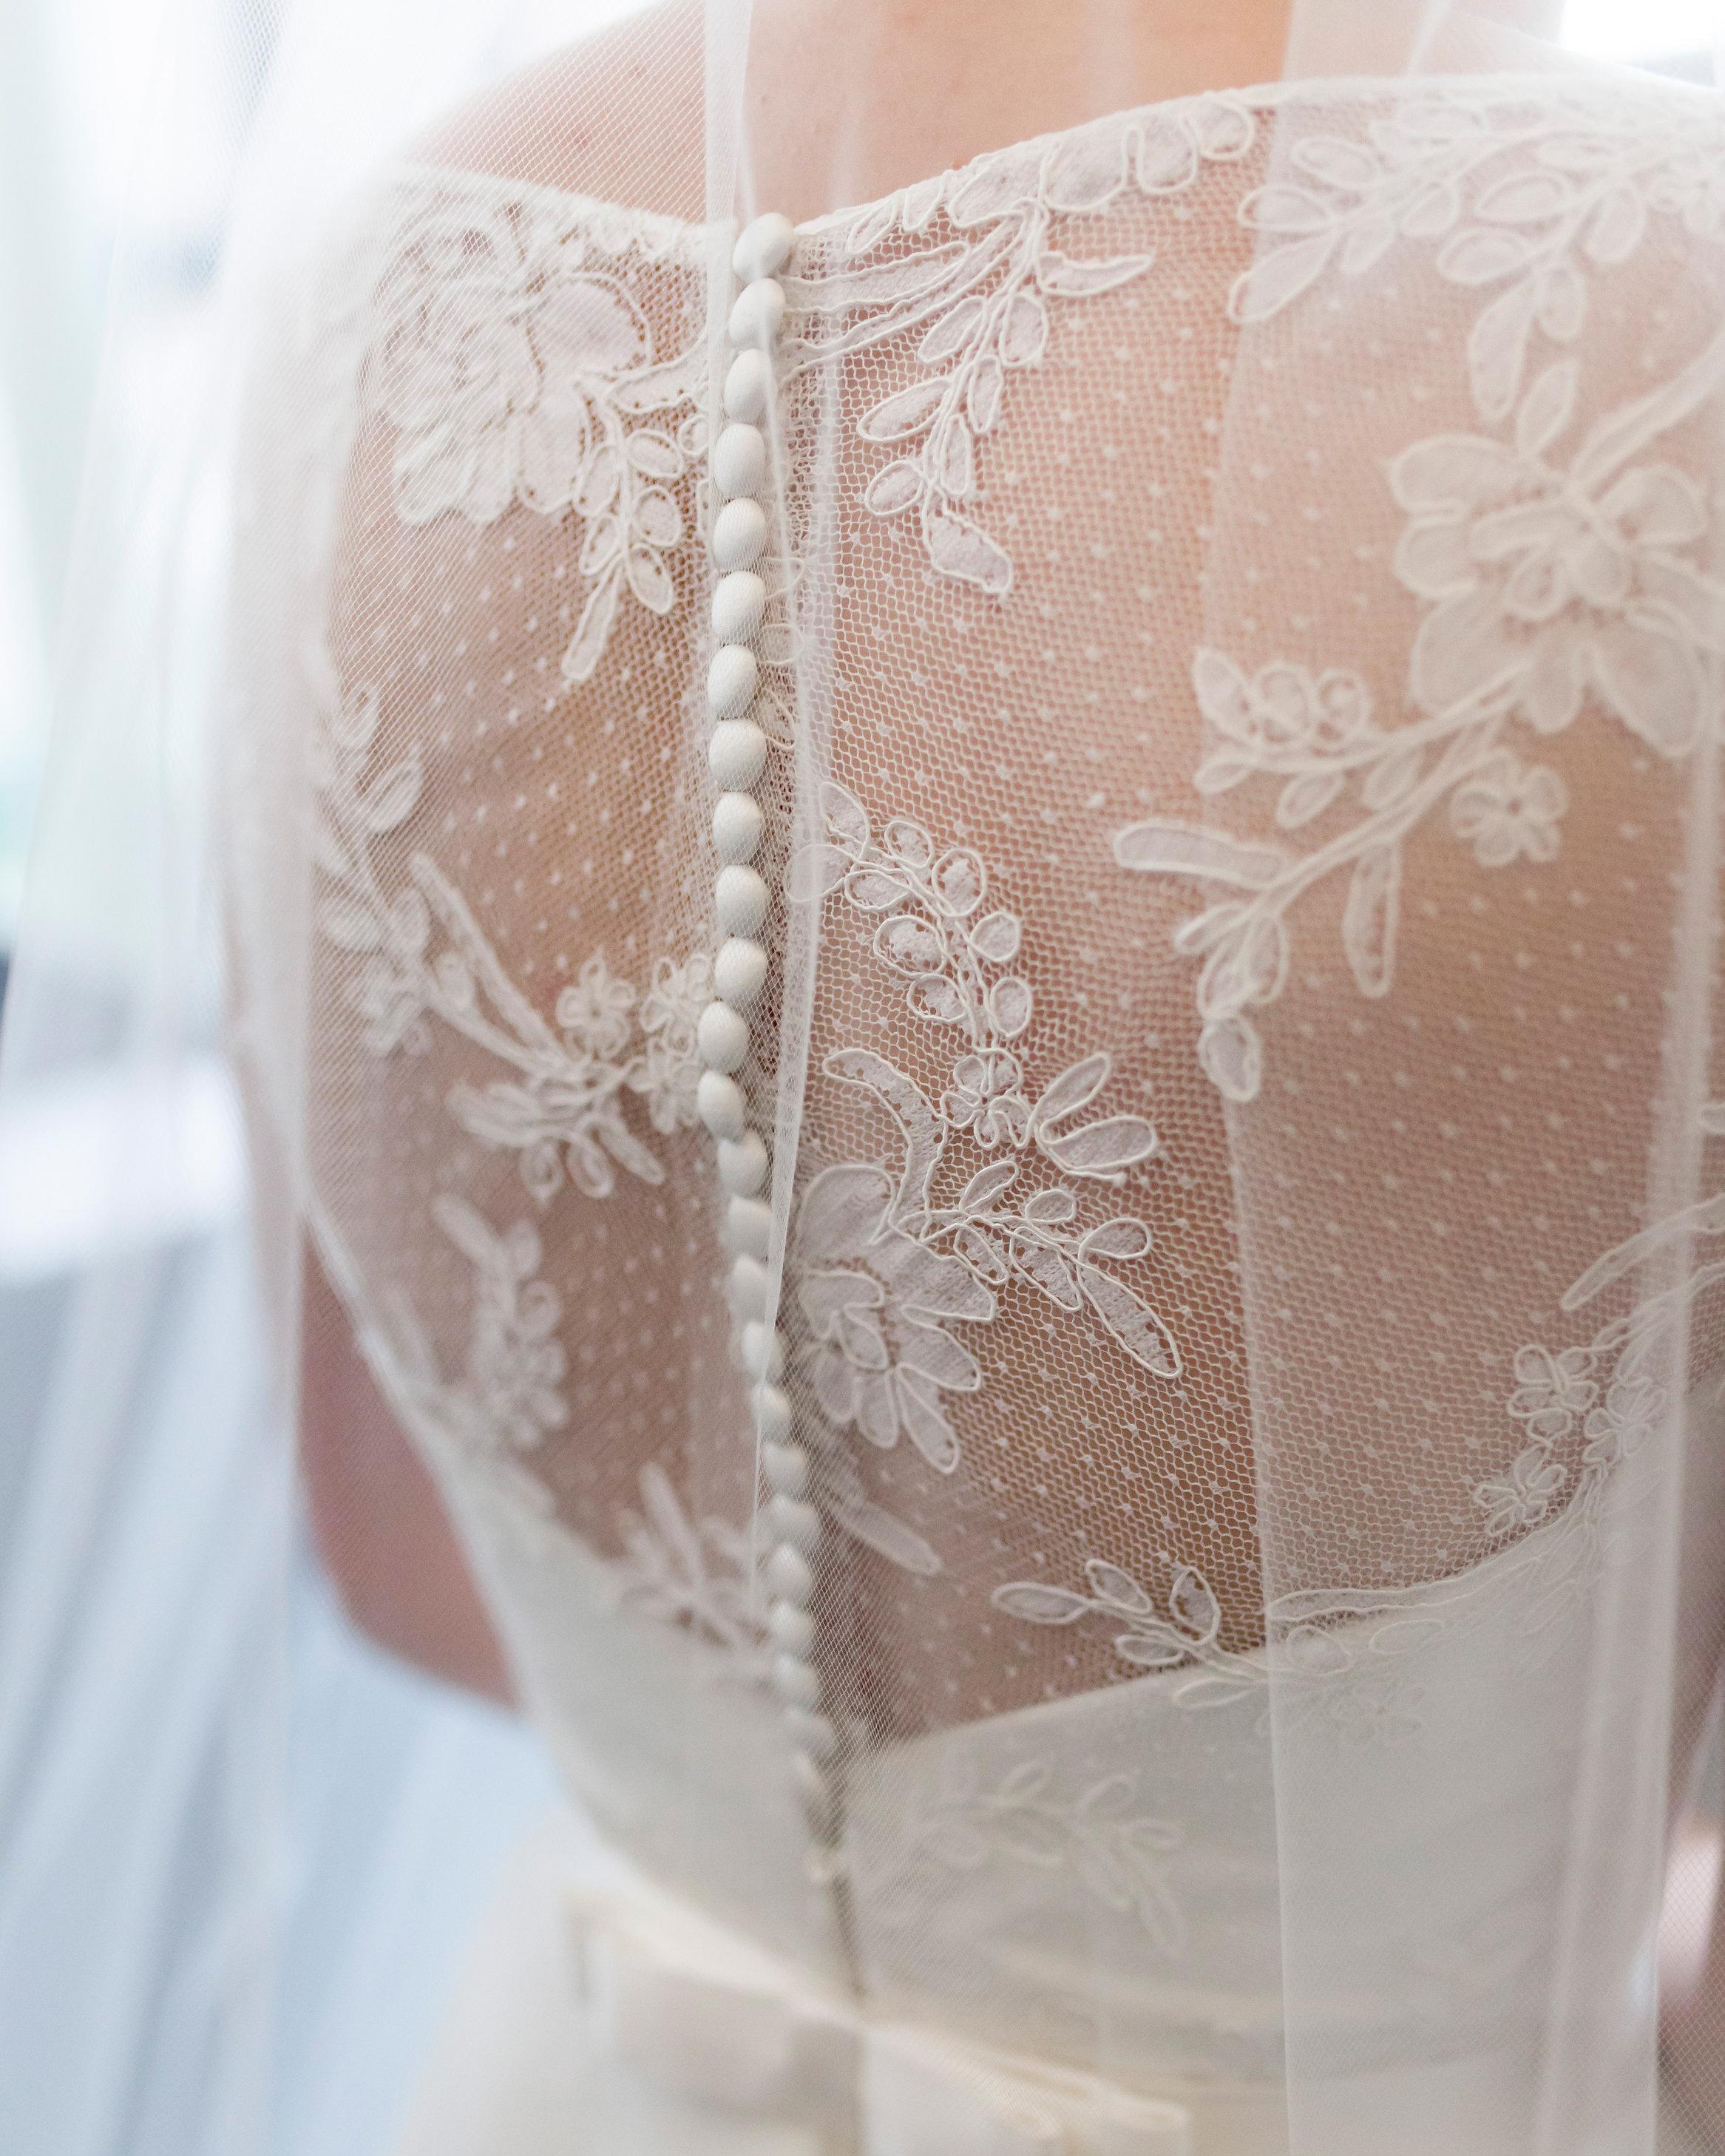 ashley-ryan-wedding-lace-6747-s111852-0415.jpg